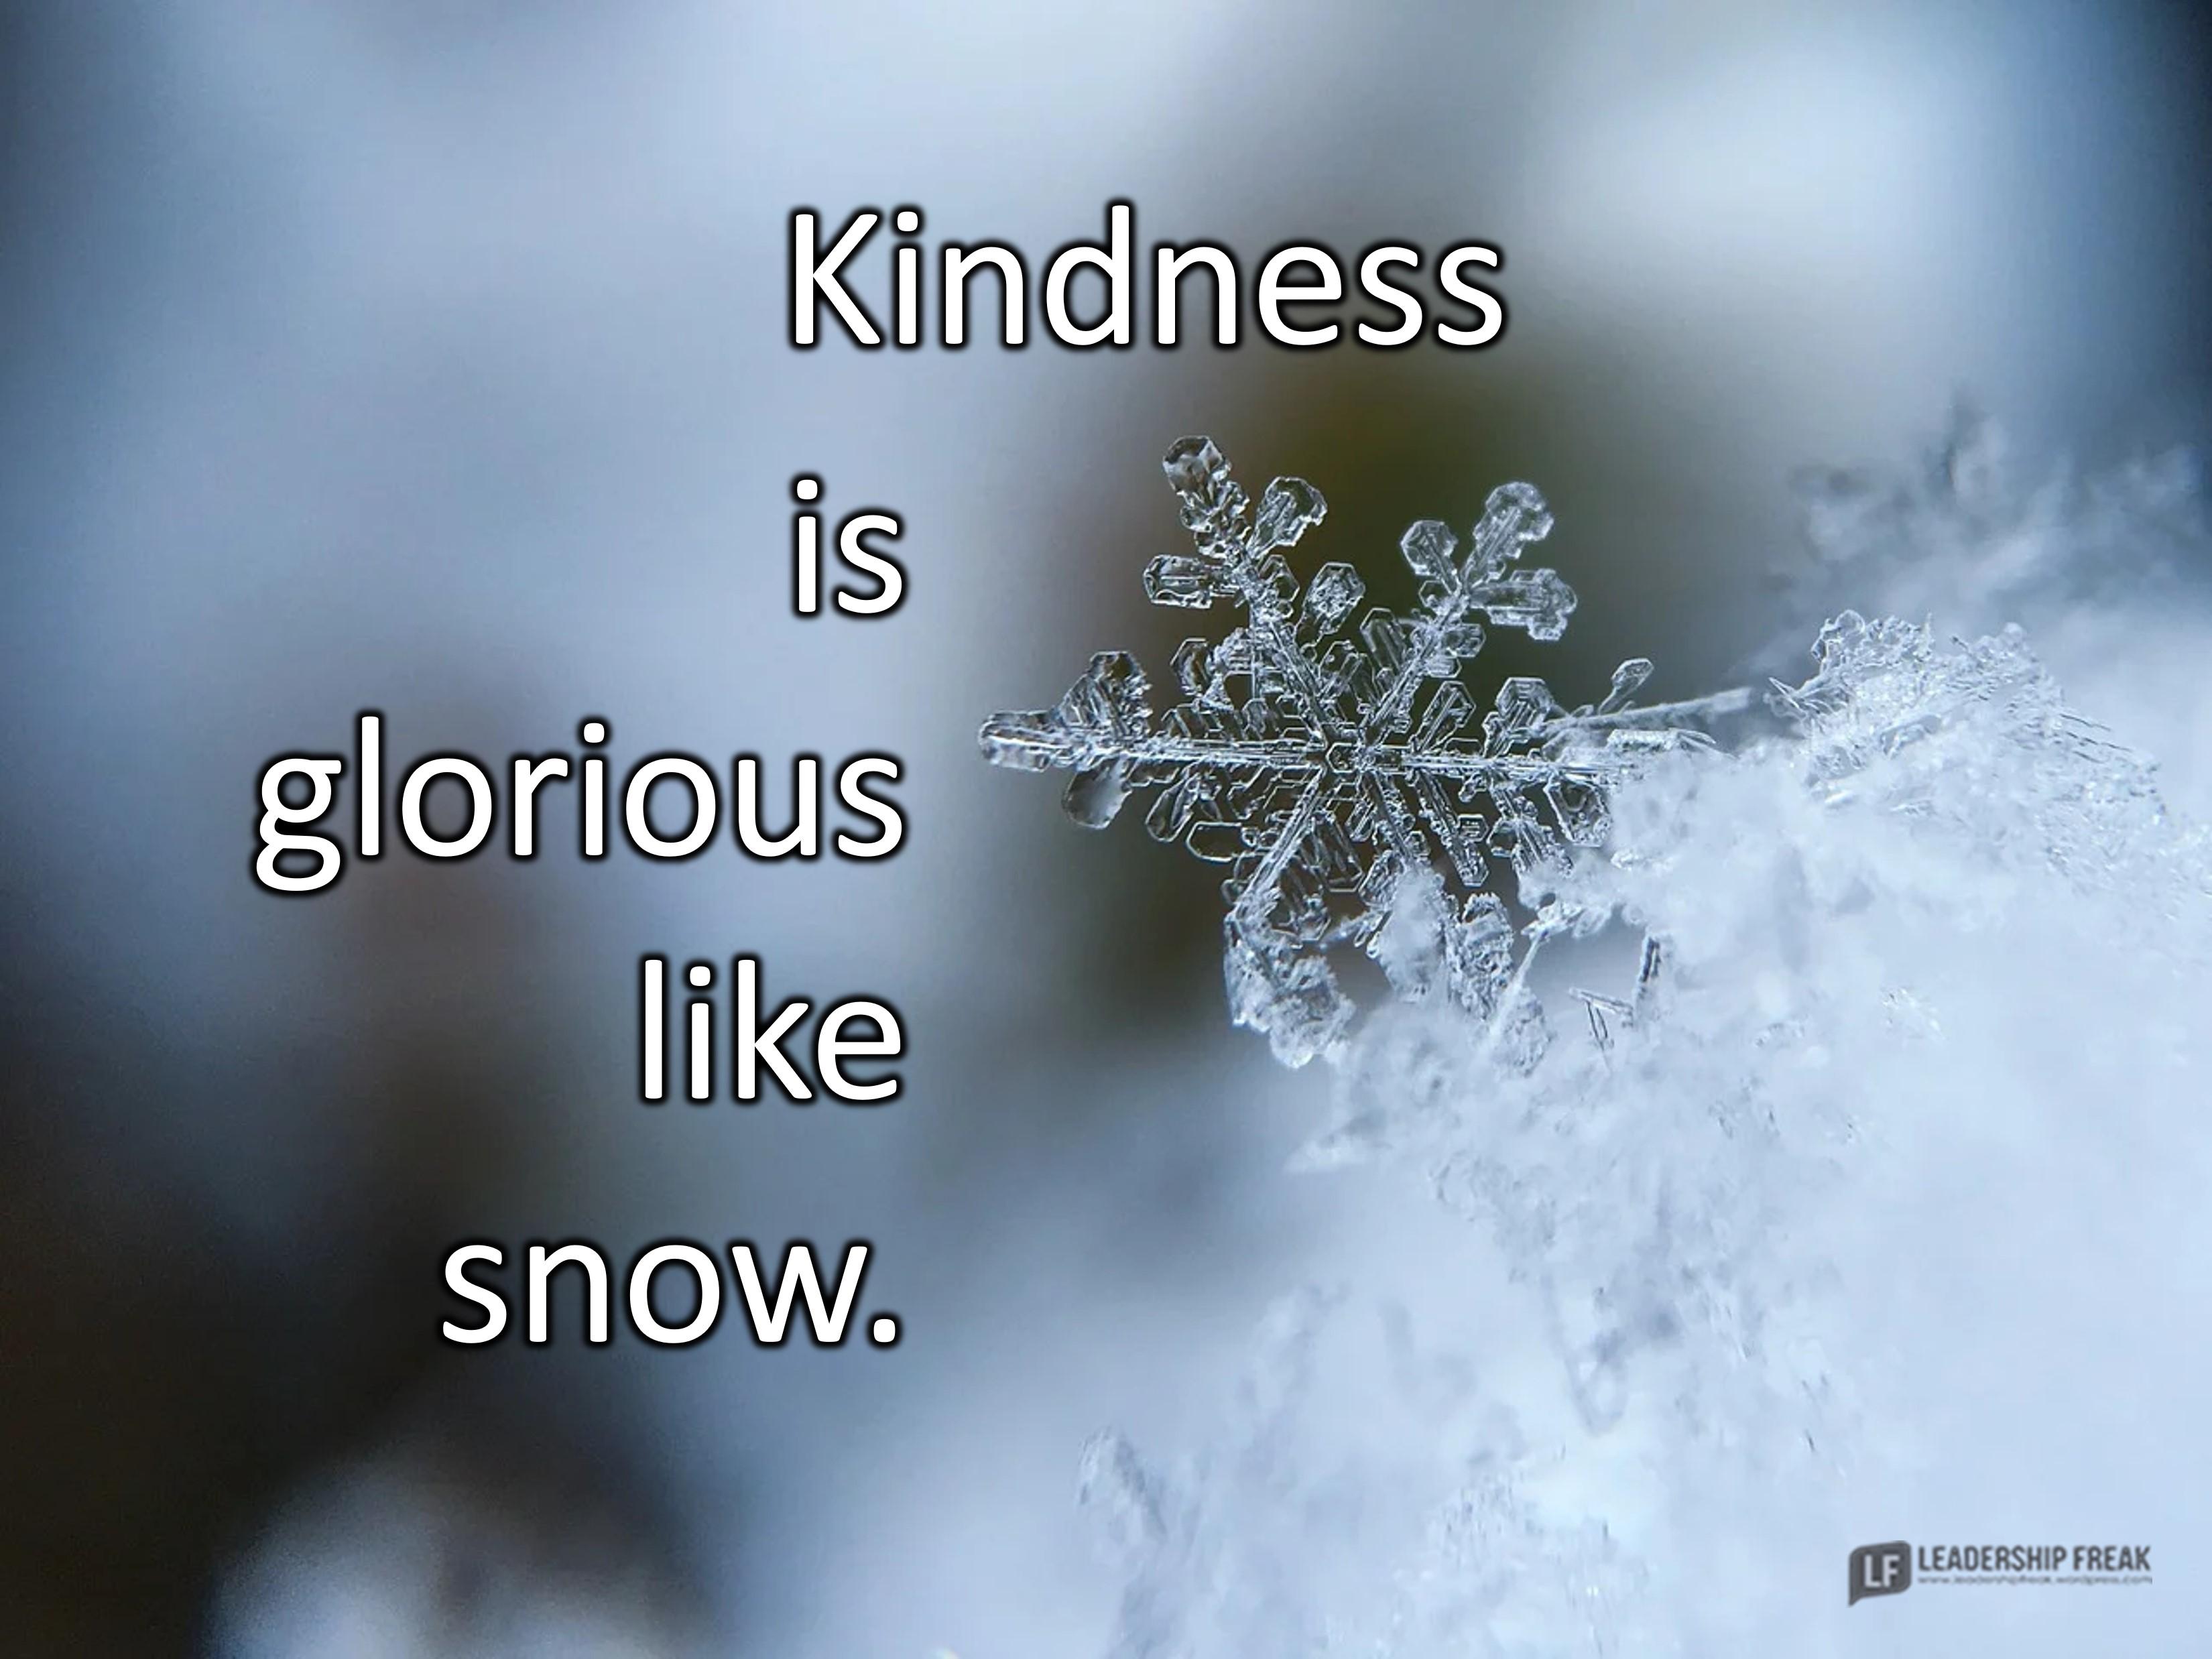 Closeup of a snowflake.   Kindness is glorious like snow.